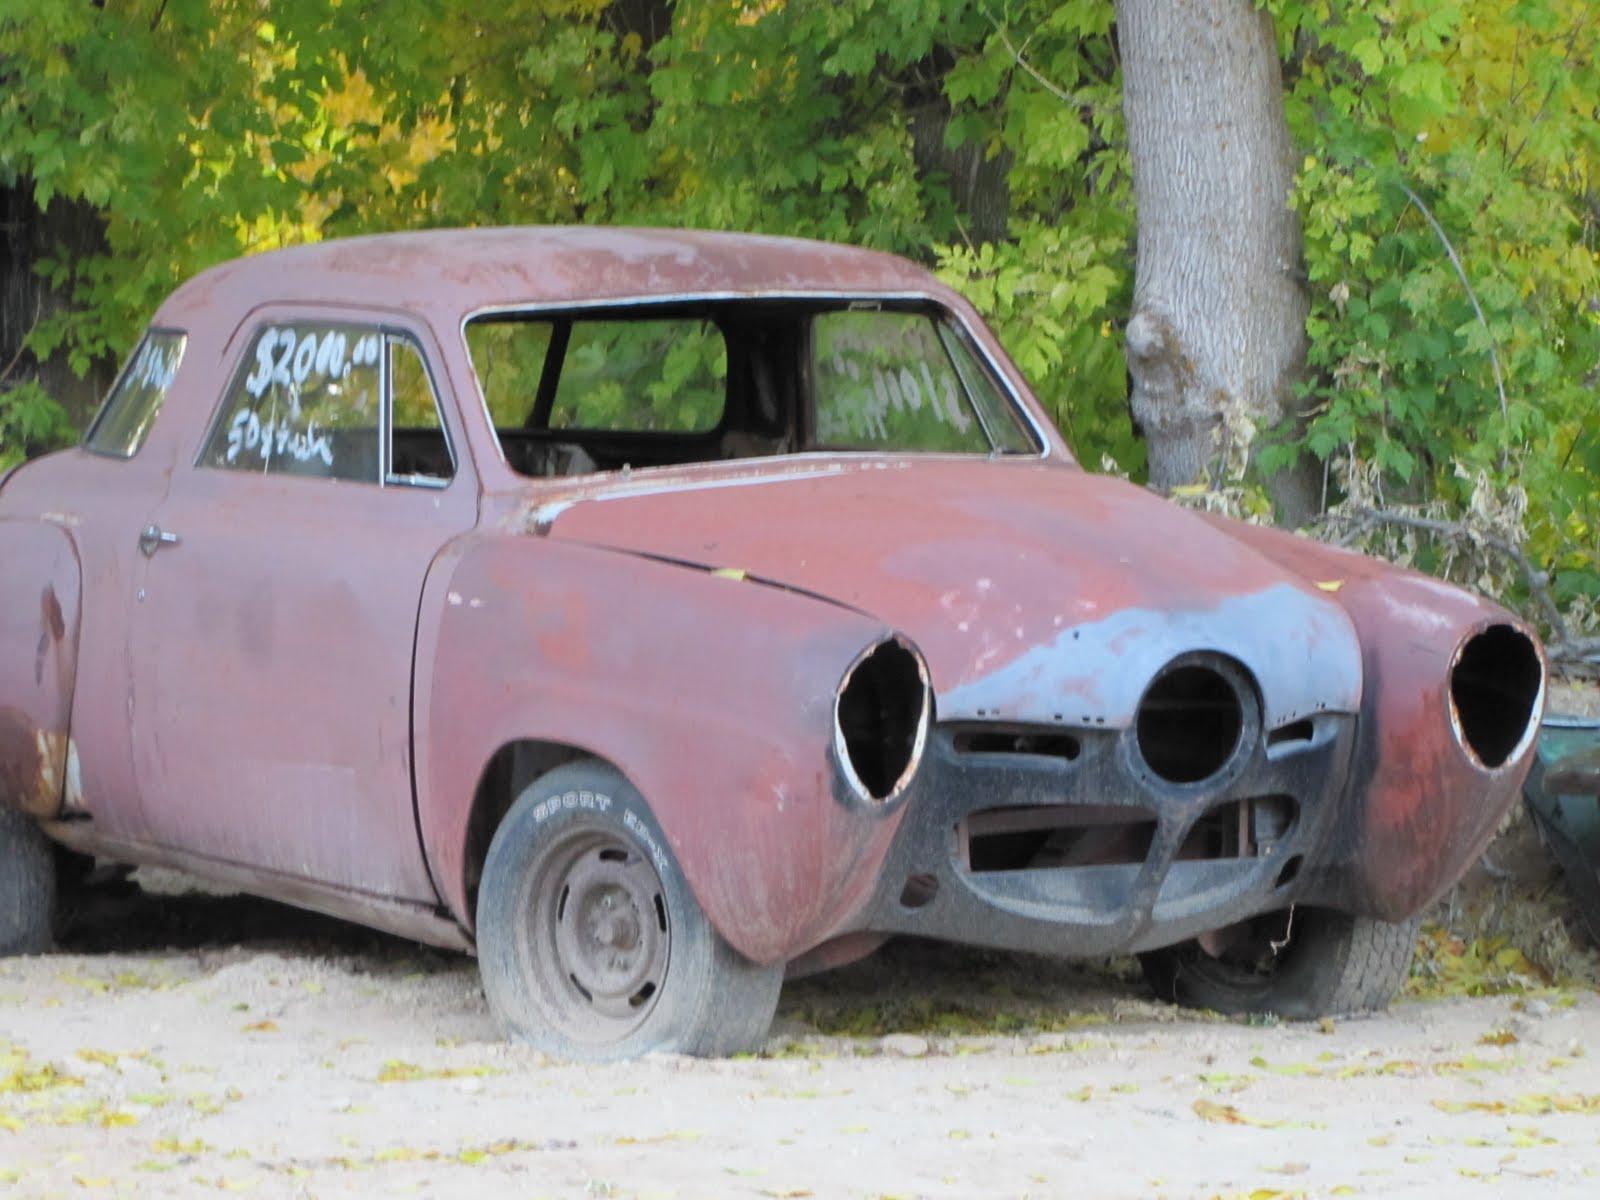 Car with 3 eyes, 1950 Studebaker Commander